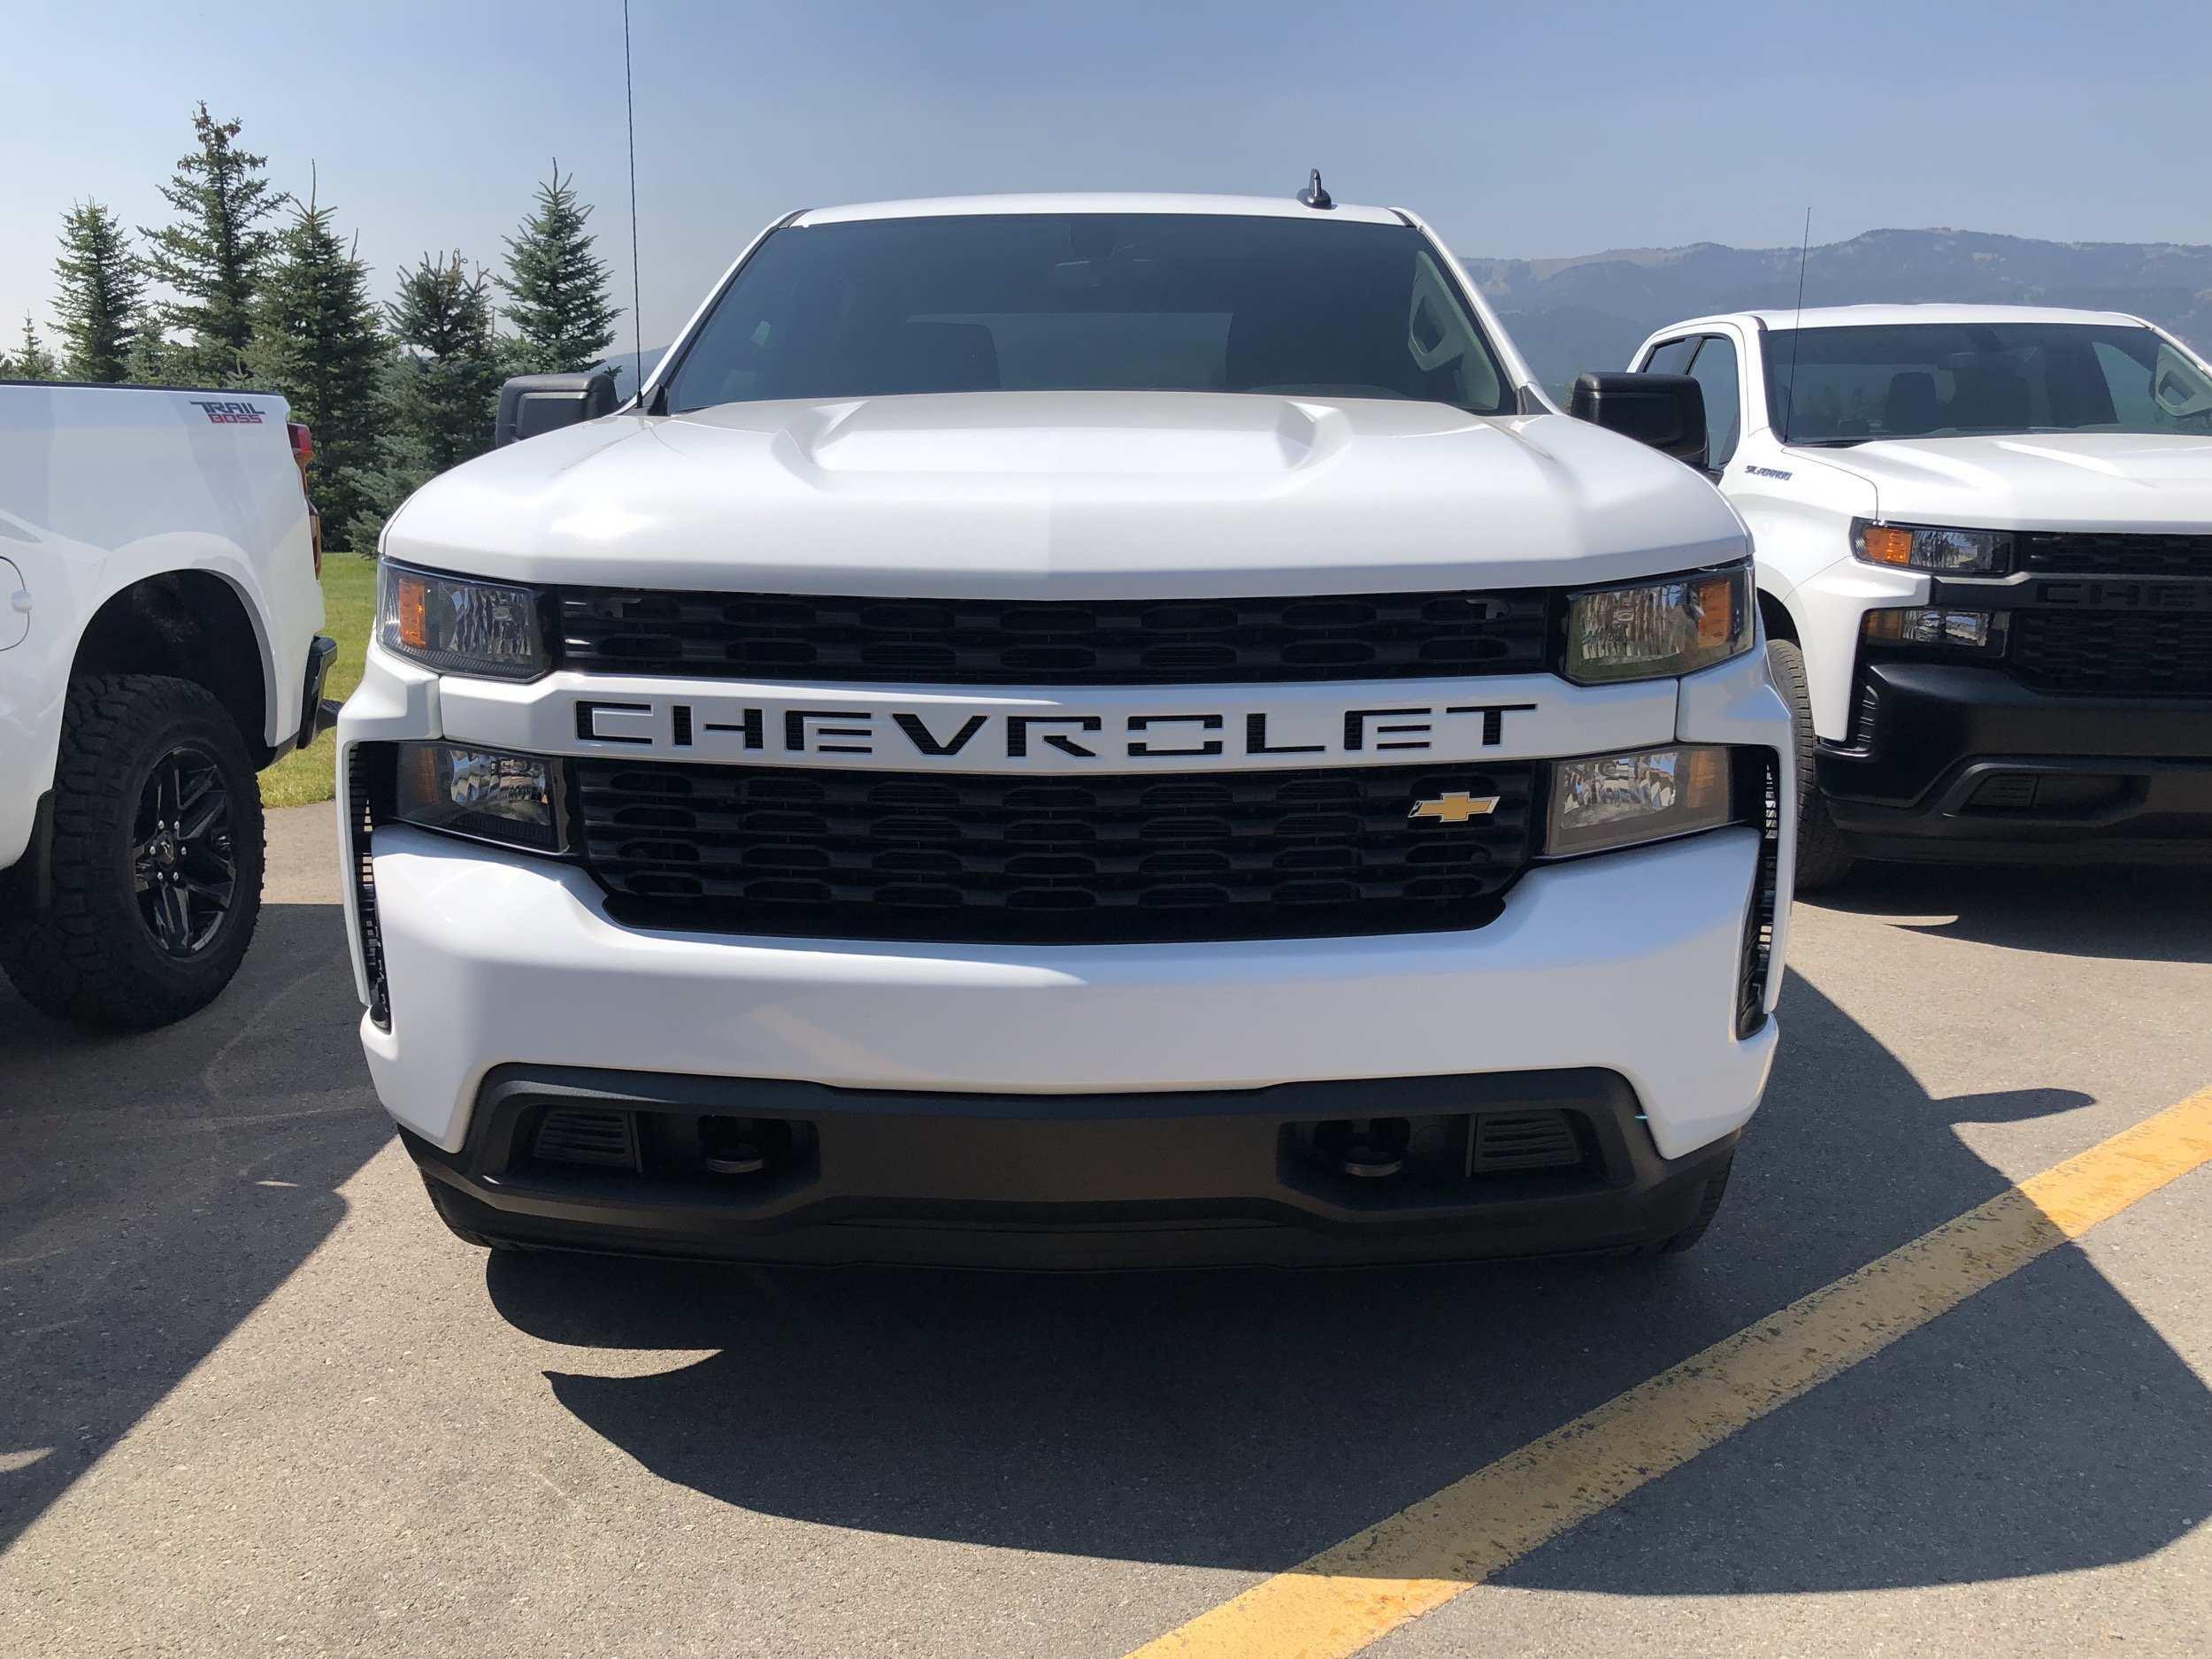 89 Gallery of Chevrolet Silverado 2020 Release Date Ratings with Chevrolet Silverado 2020 Release Date